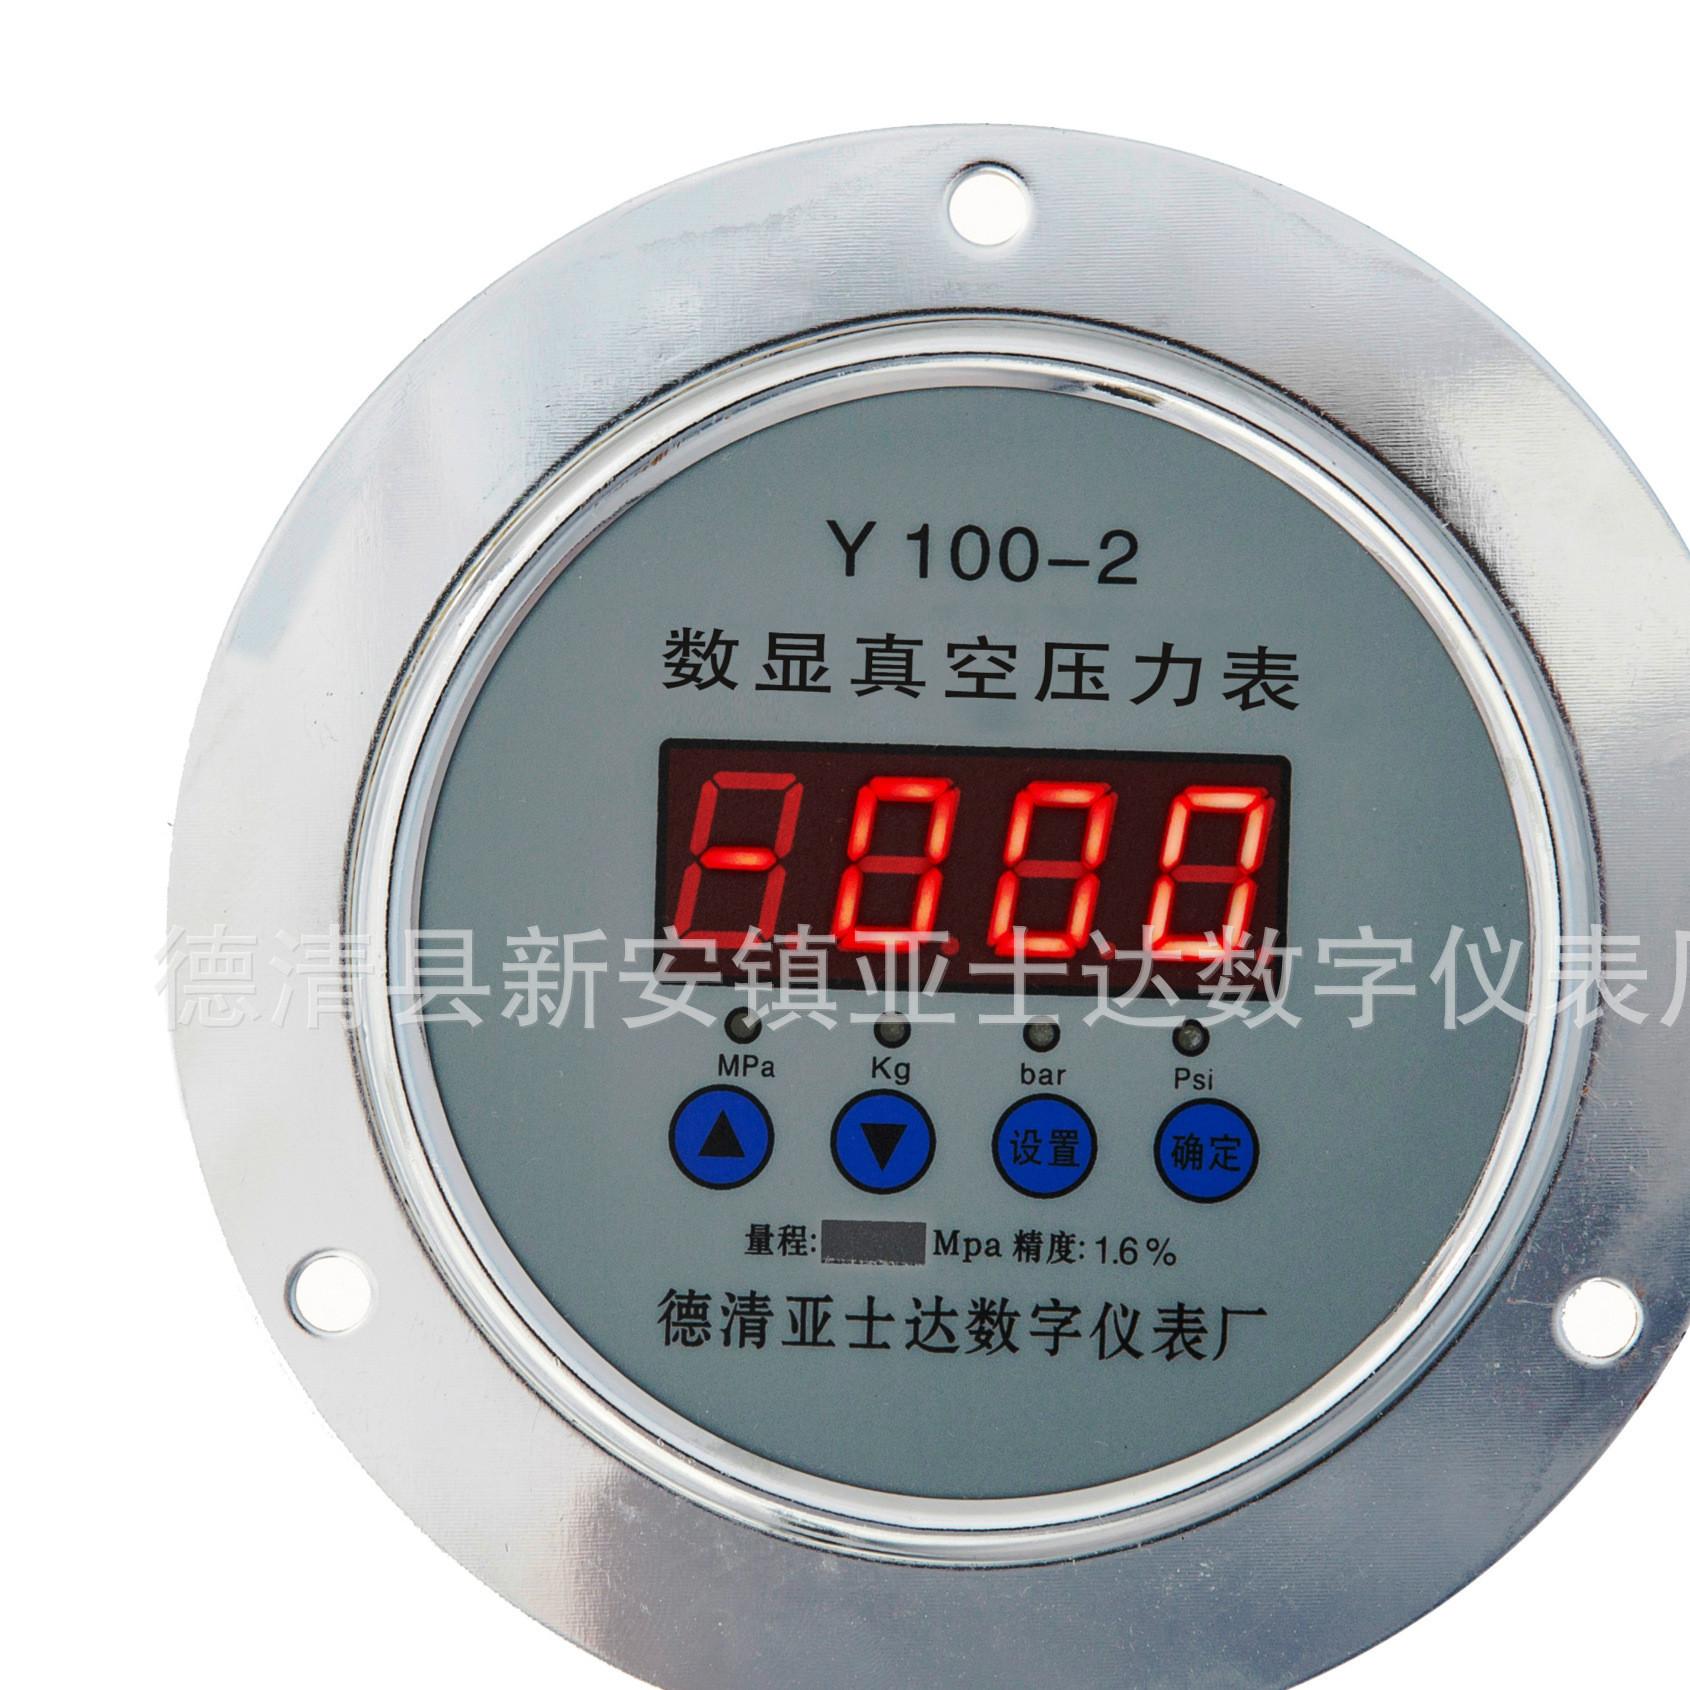 Y100轴向不锈钢数显真空压力表数字耐震压力表气压水压油压力表